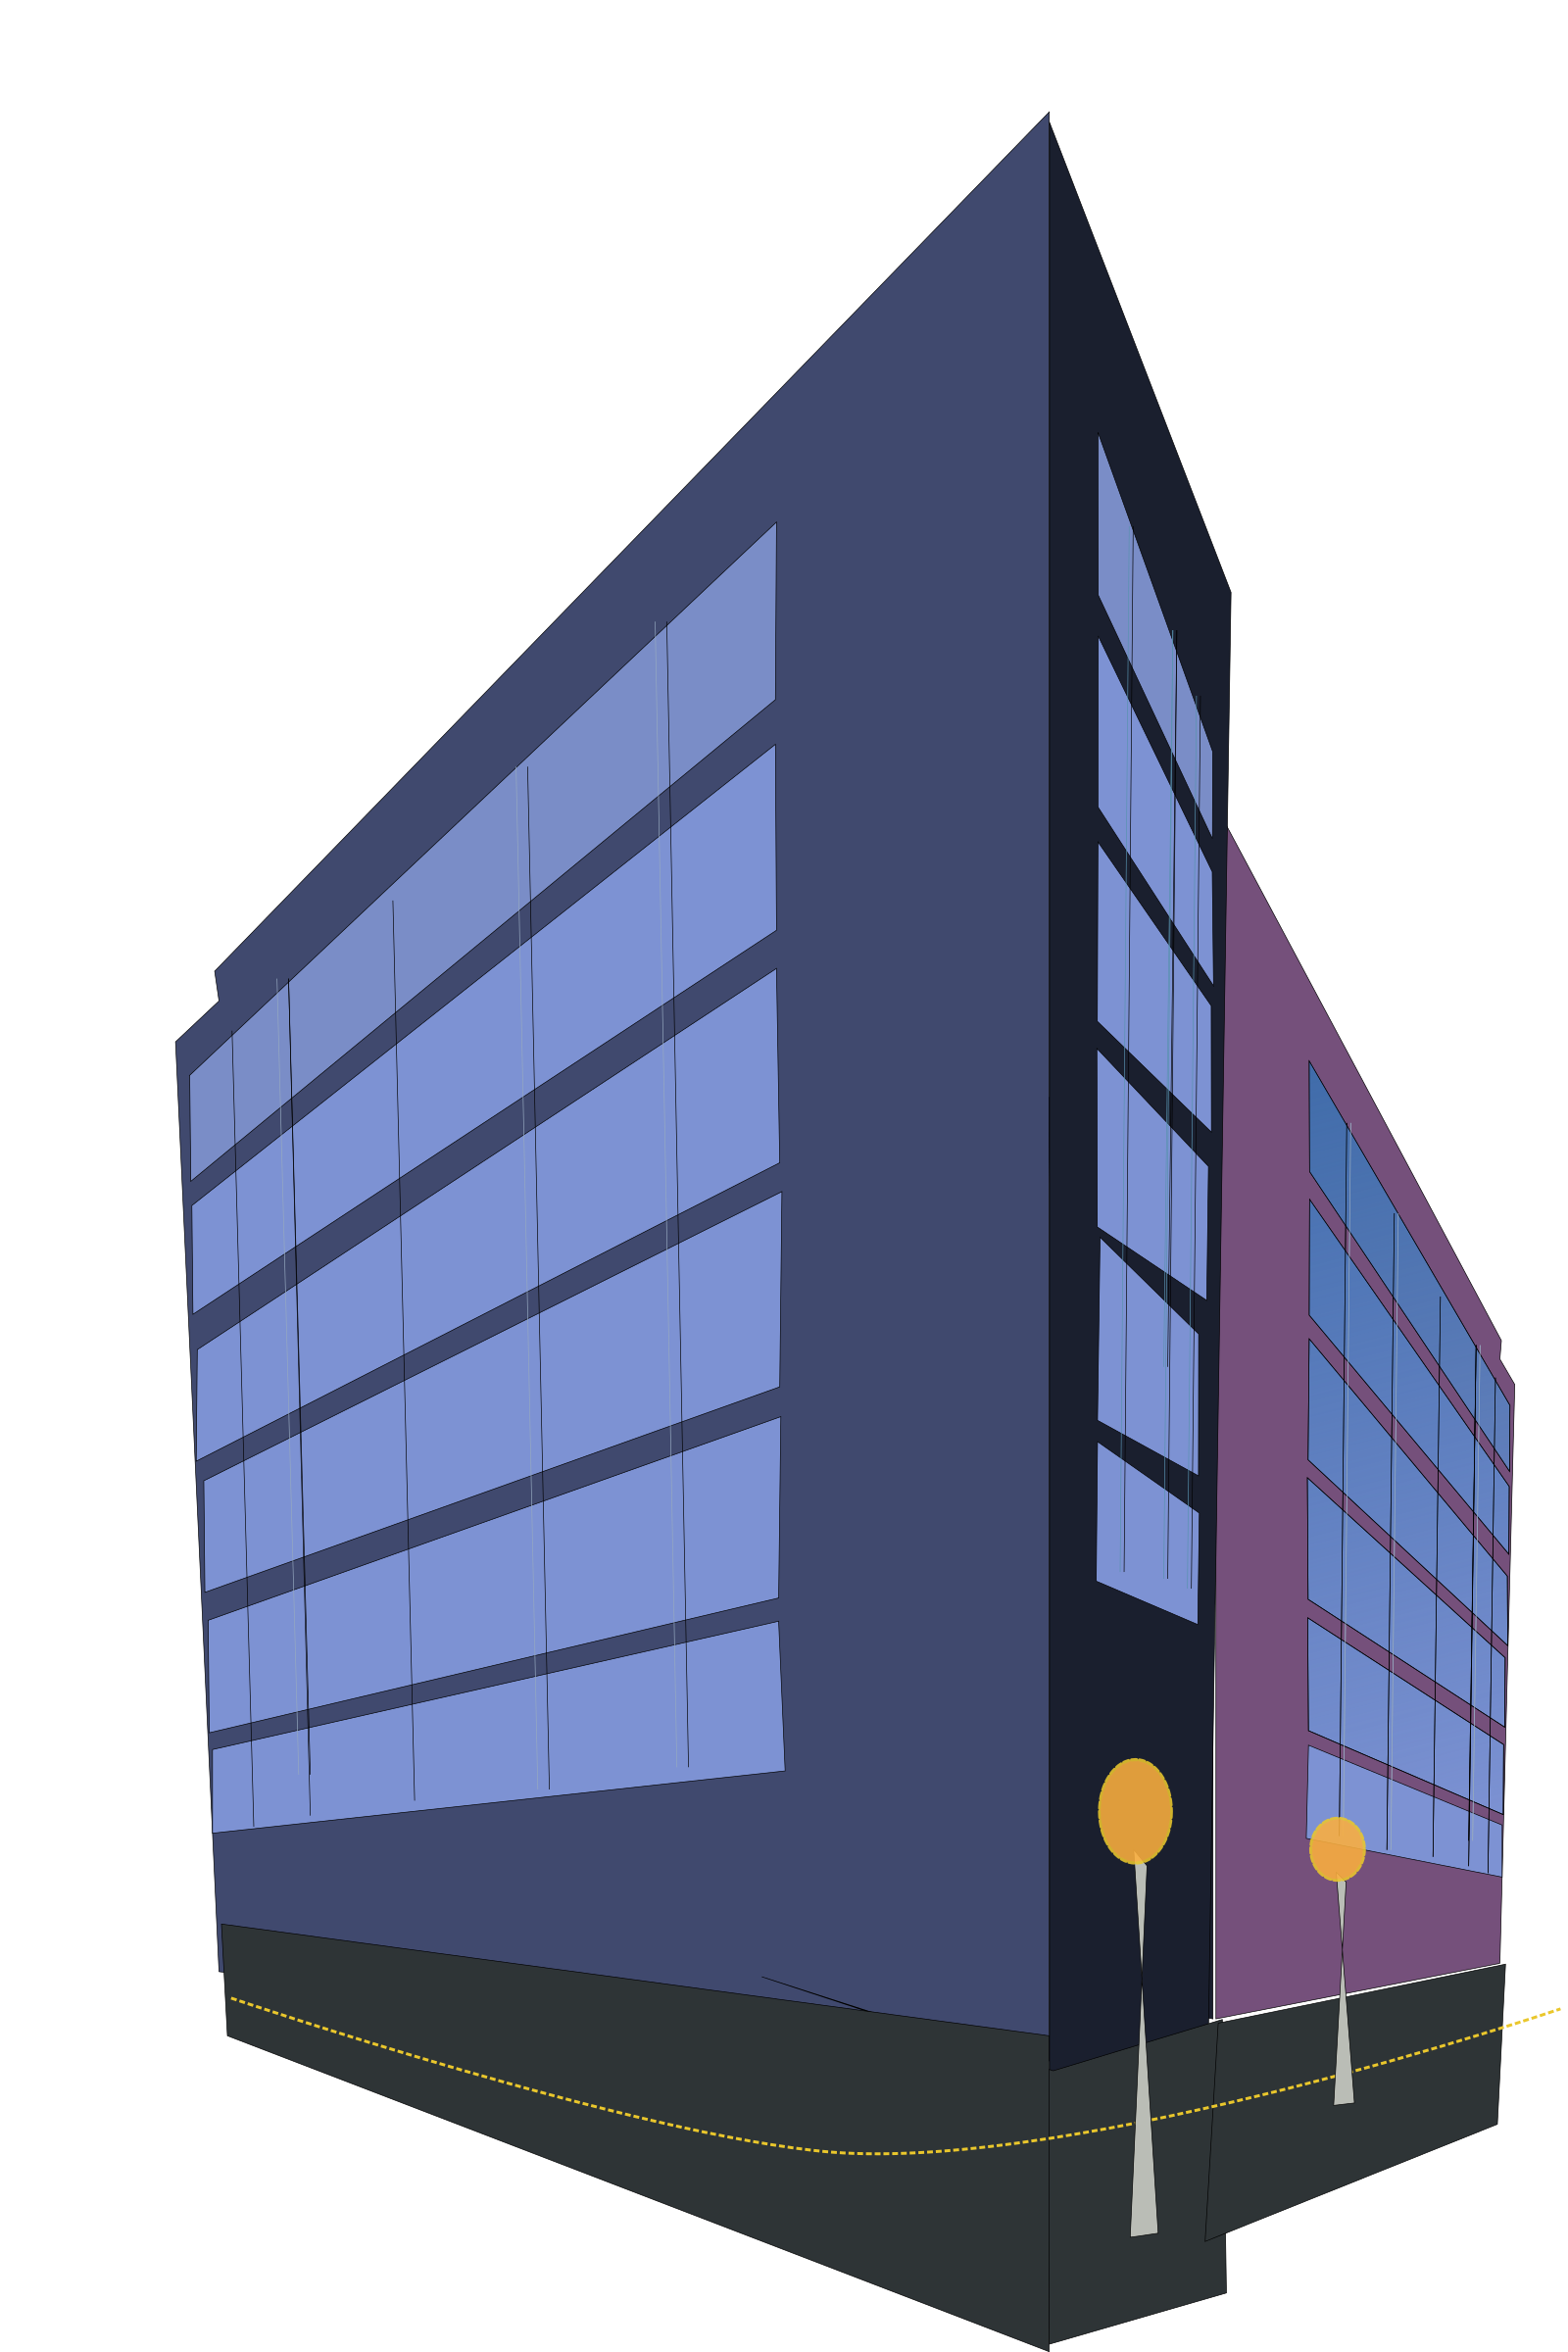 Building commercial building